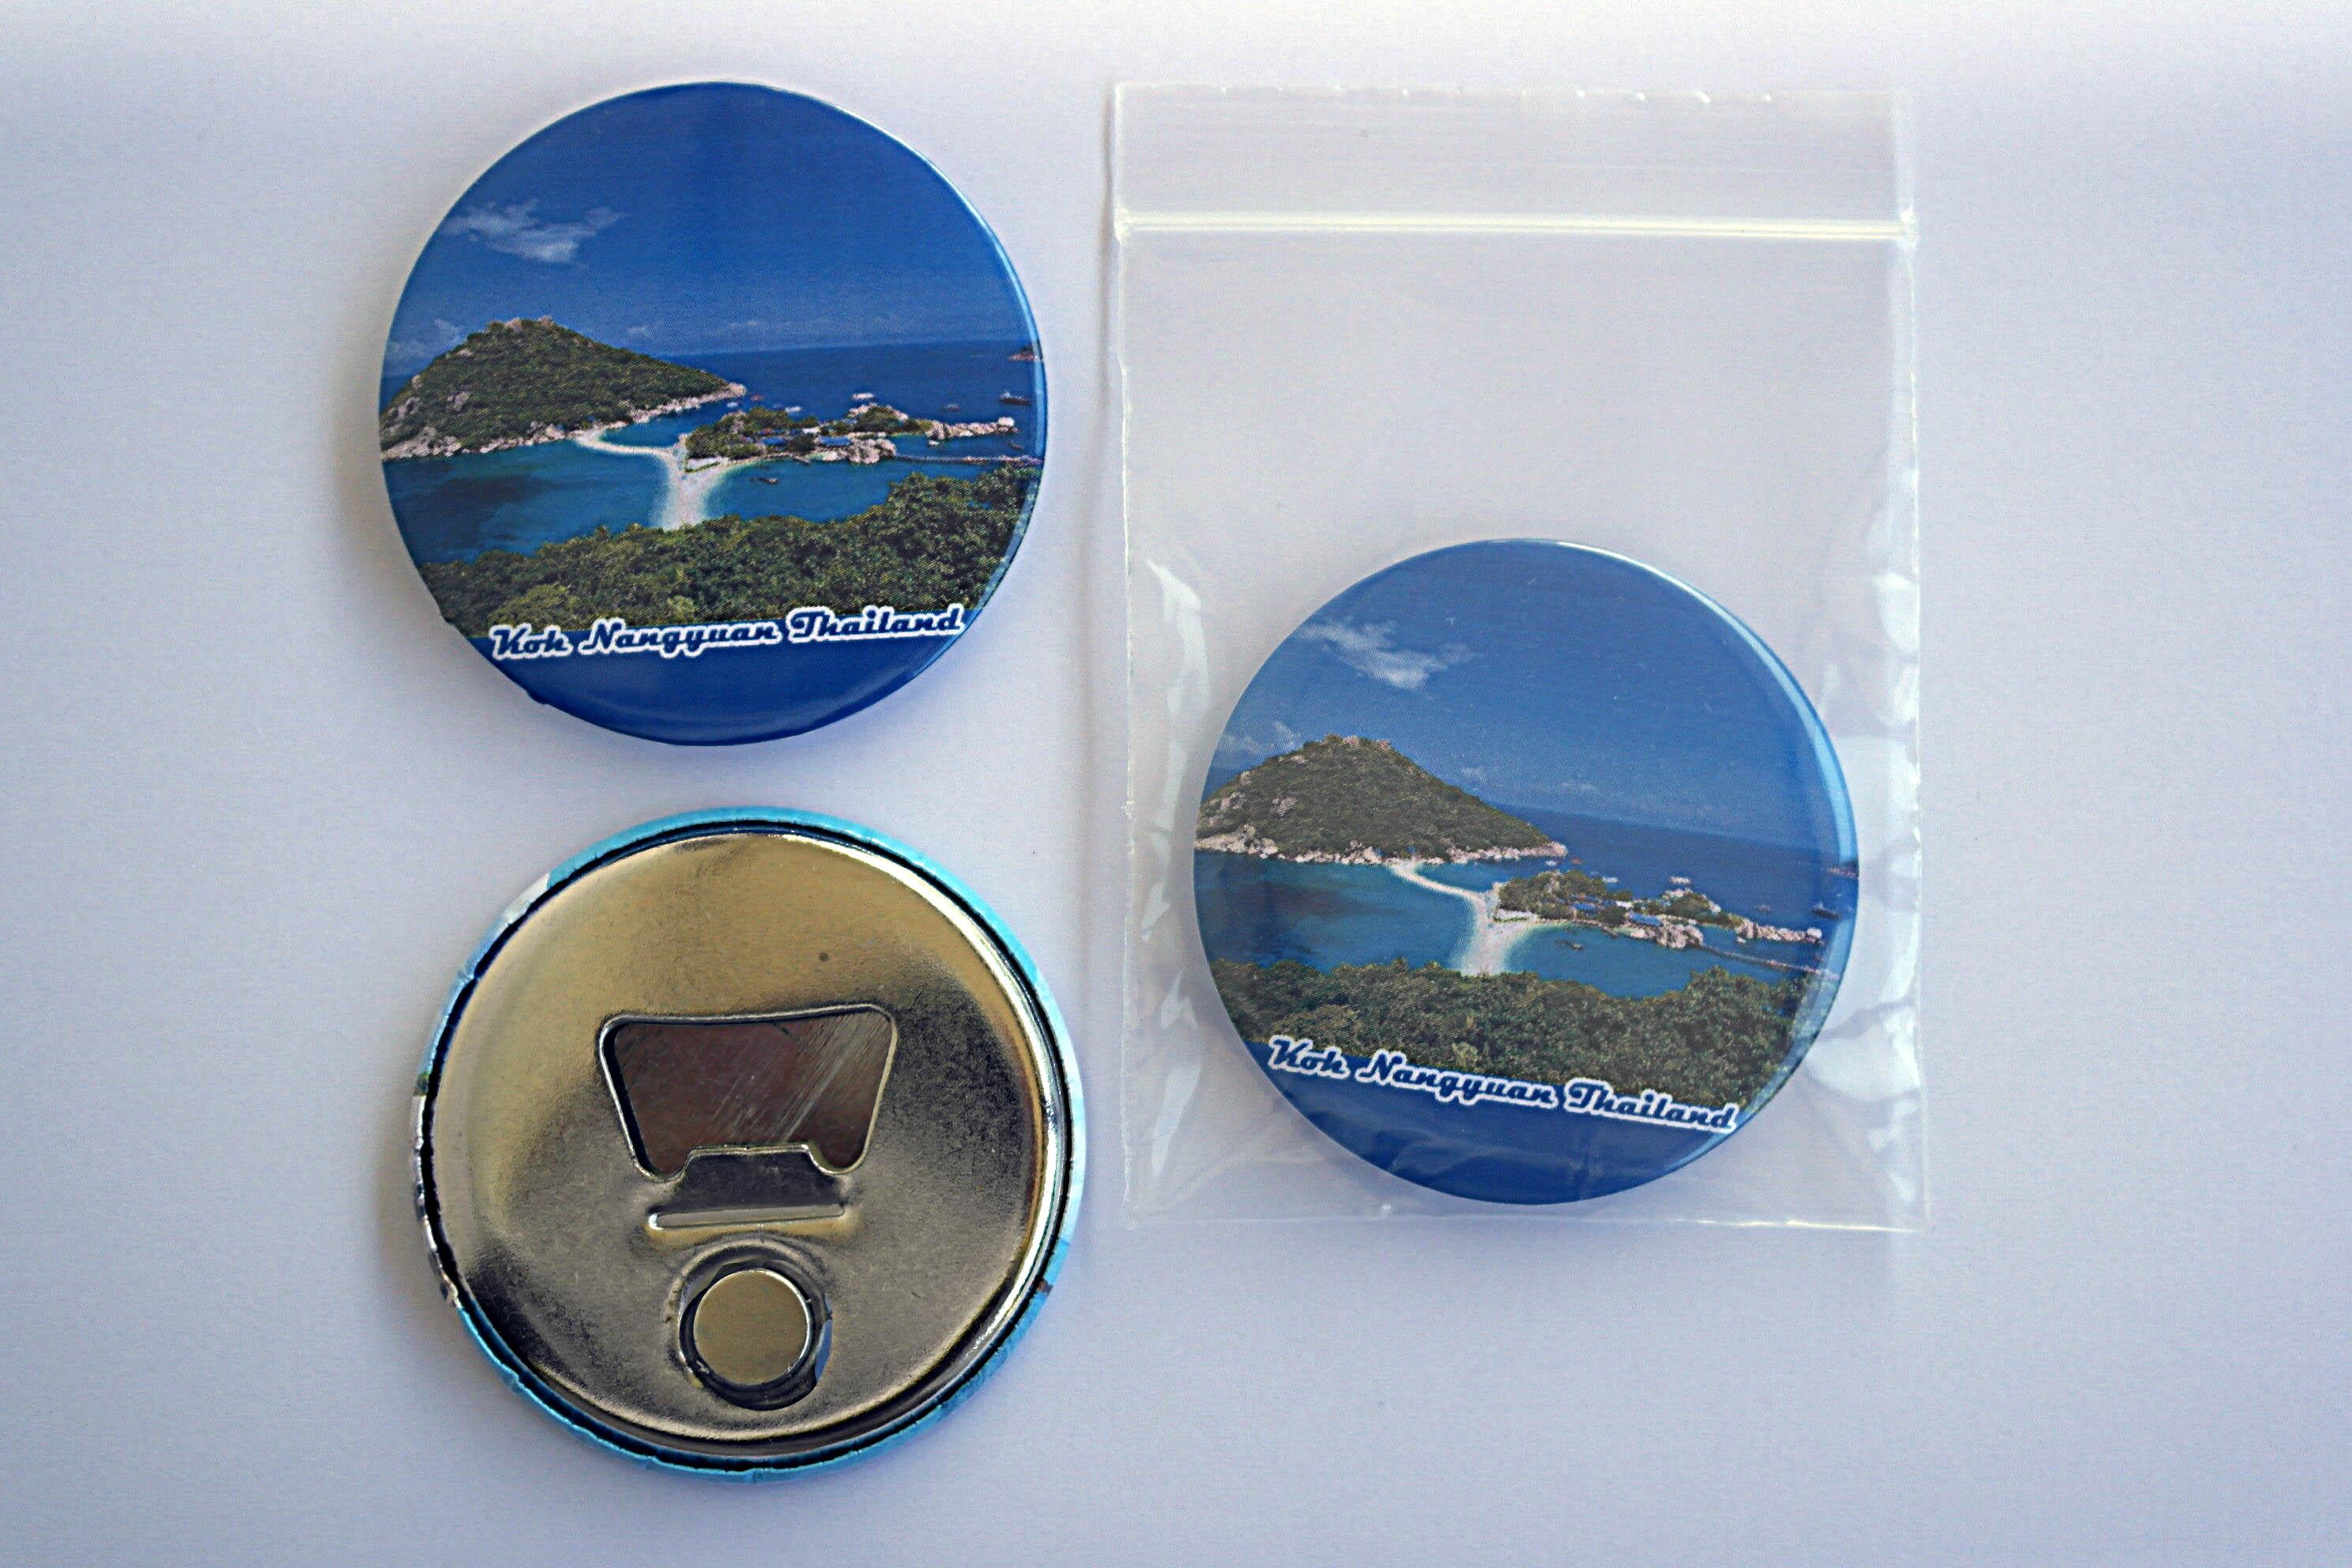 Koh Nangyuan 58 mm Fridge Magnet